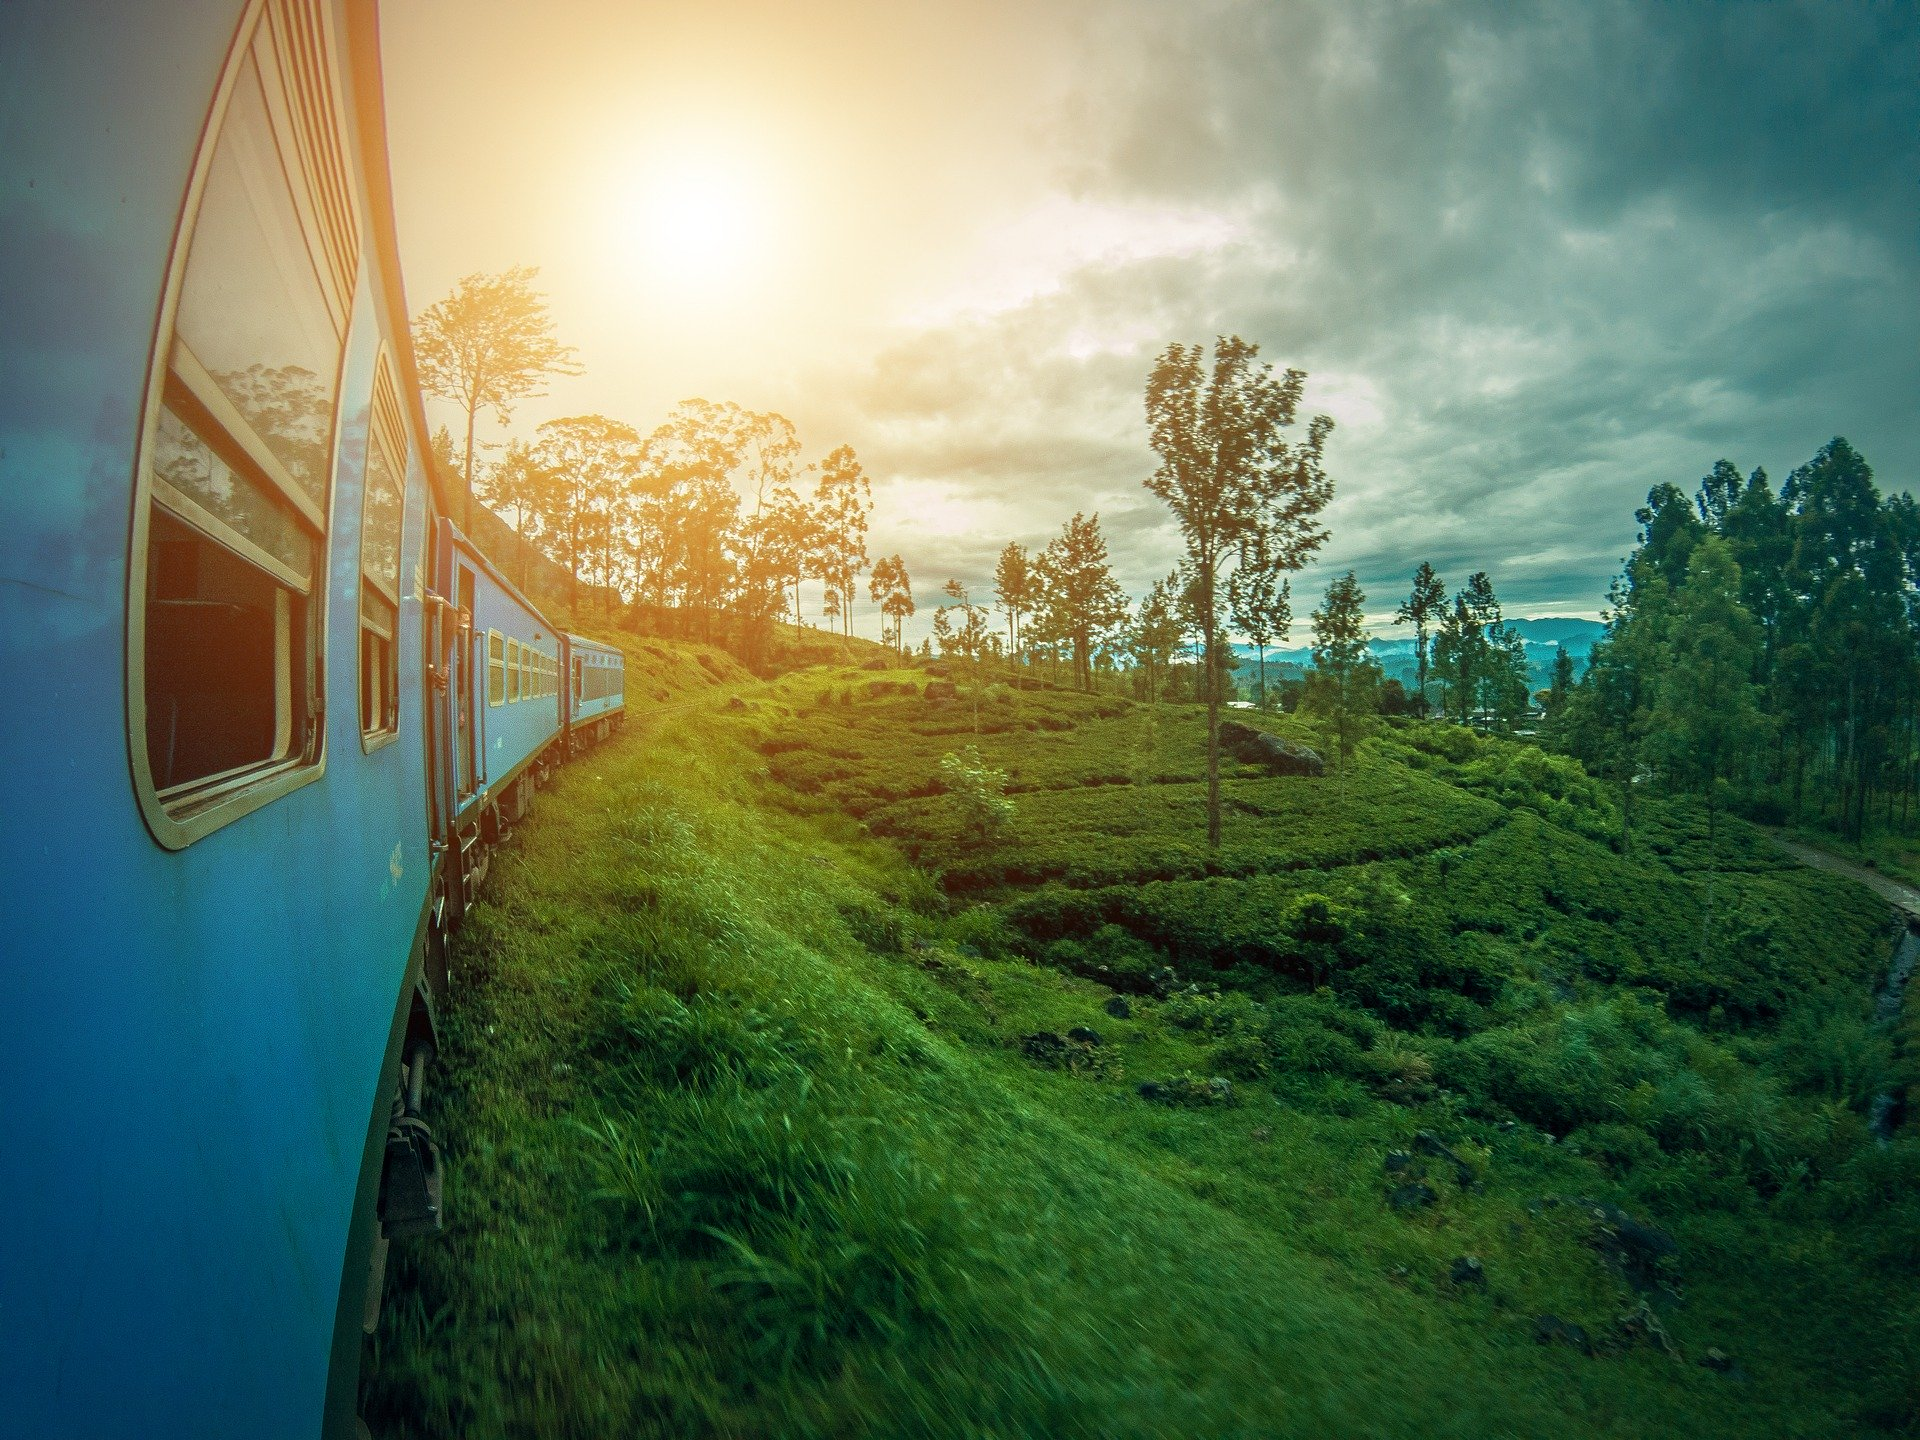 photo credit: amanjahemal (pixaby)